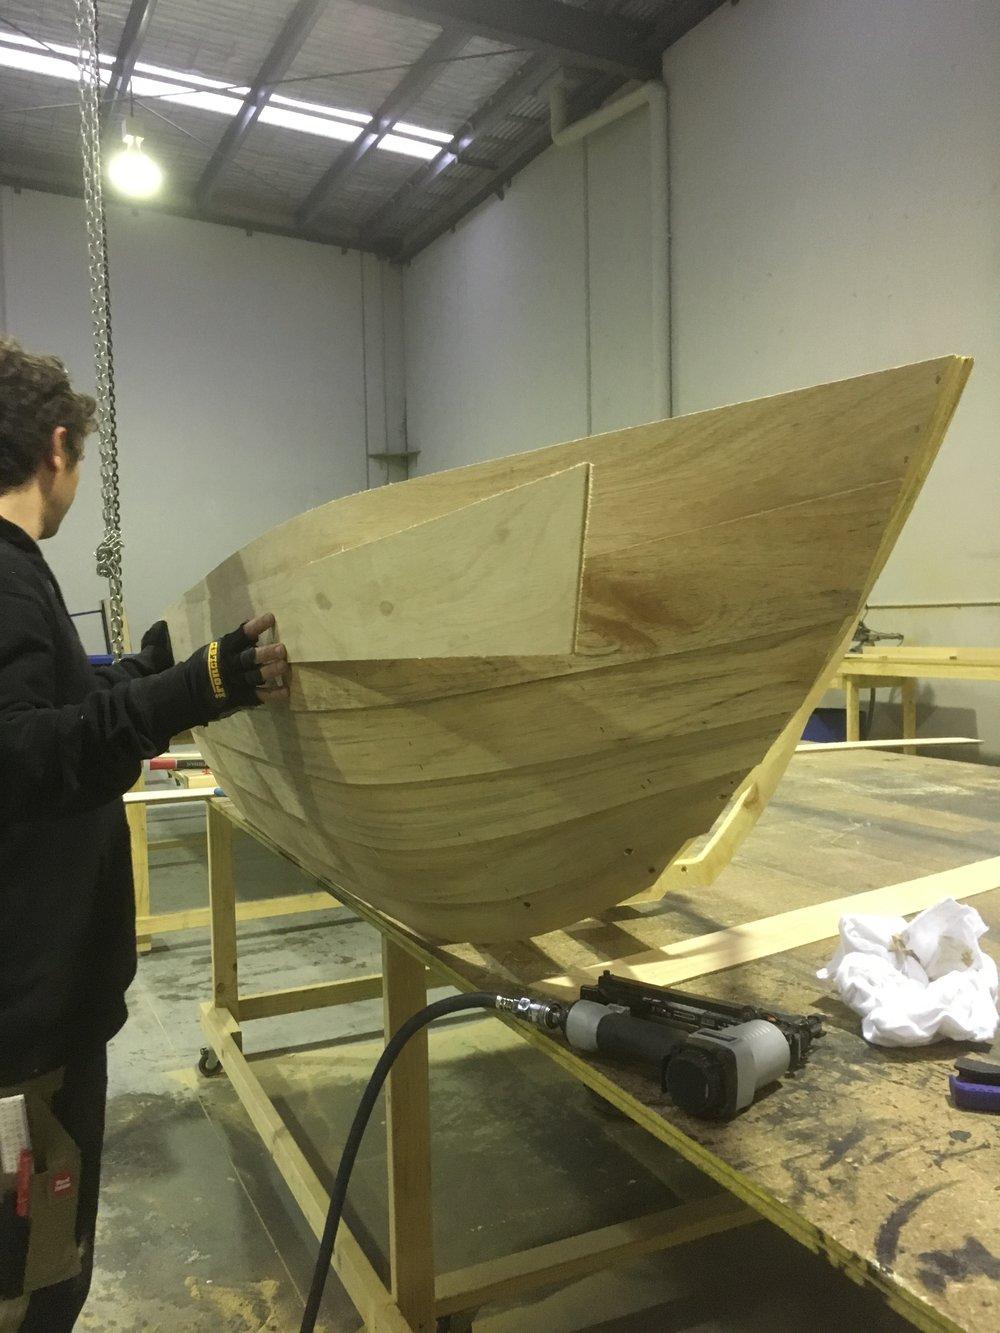 The Little Mermaid - Row Boat.JPG